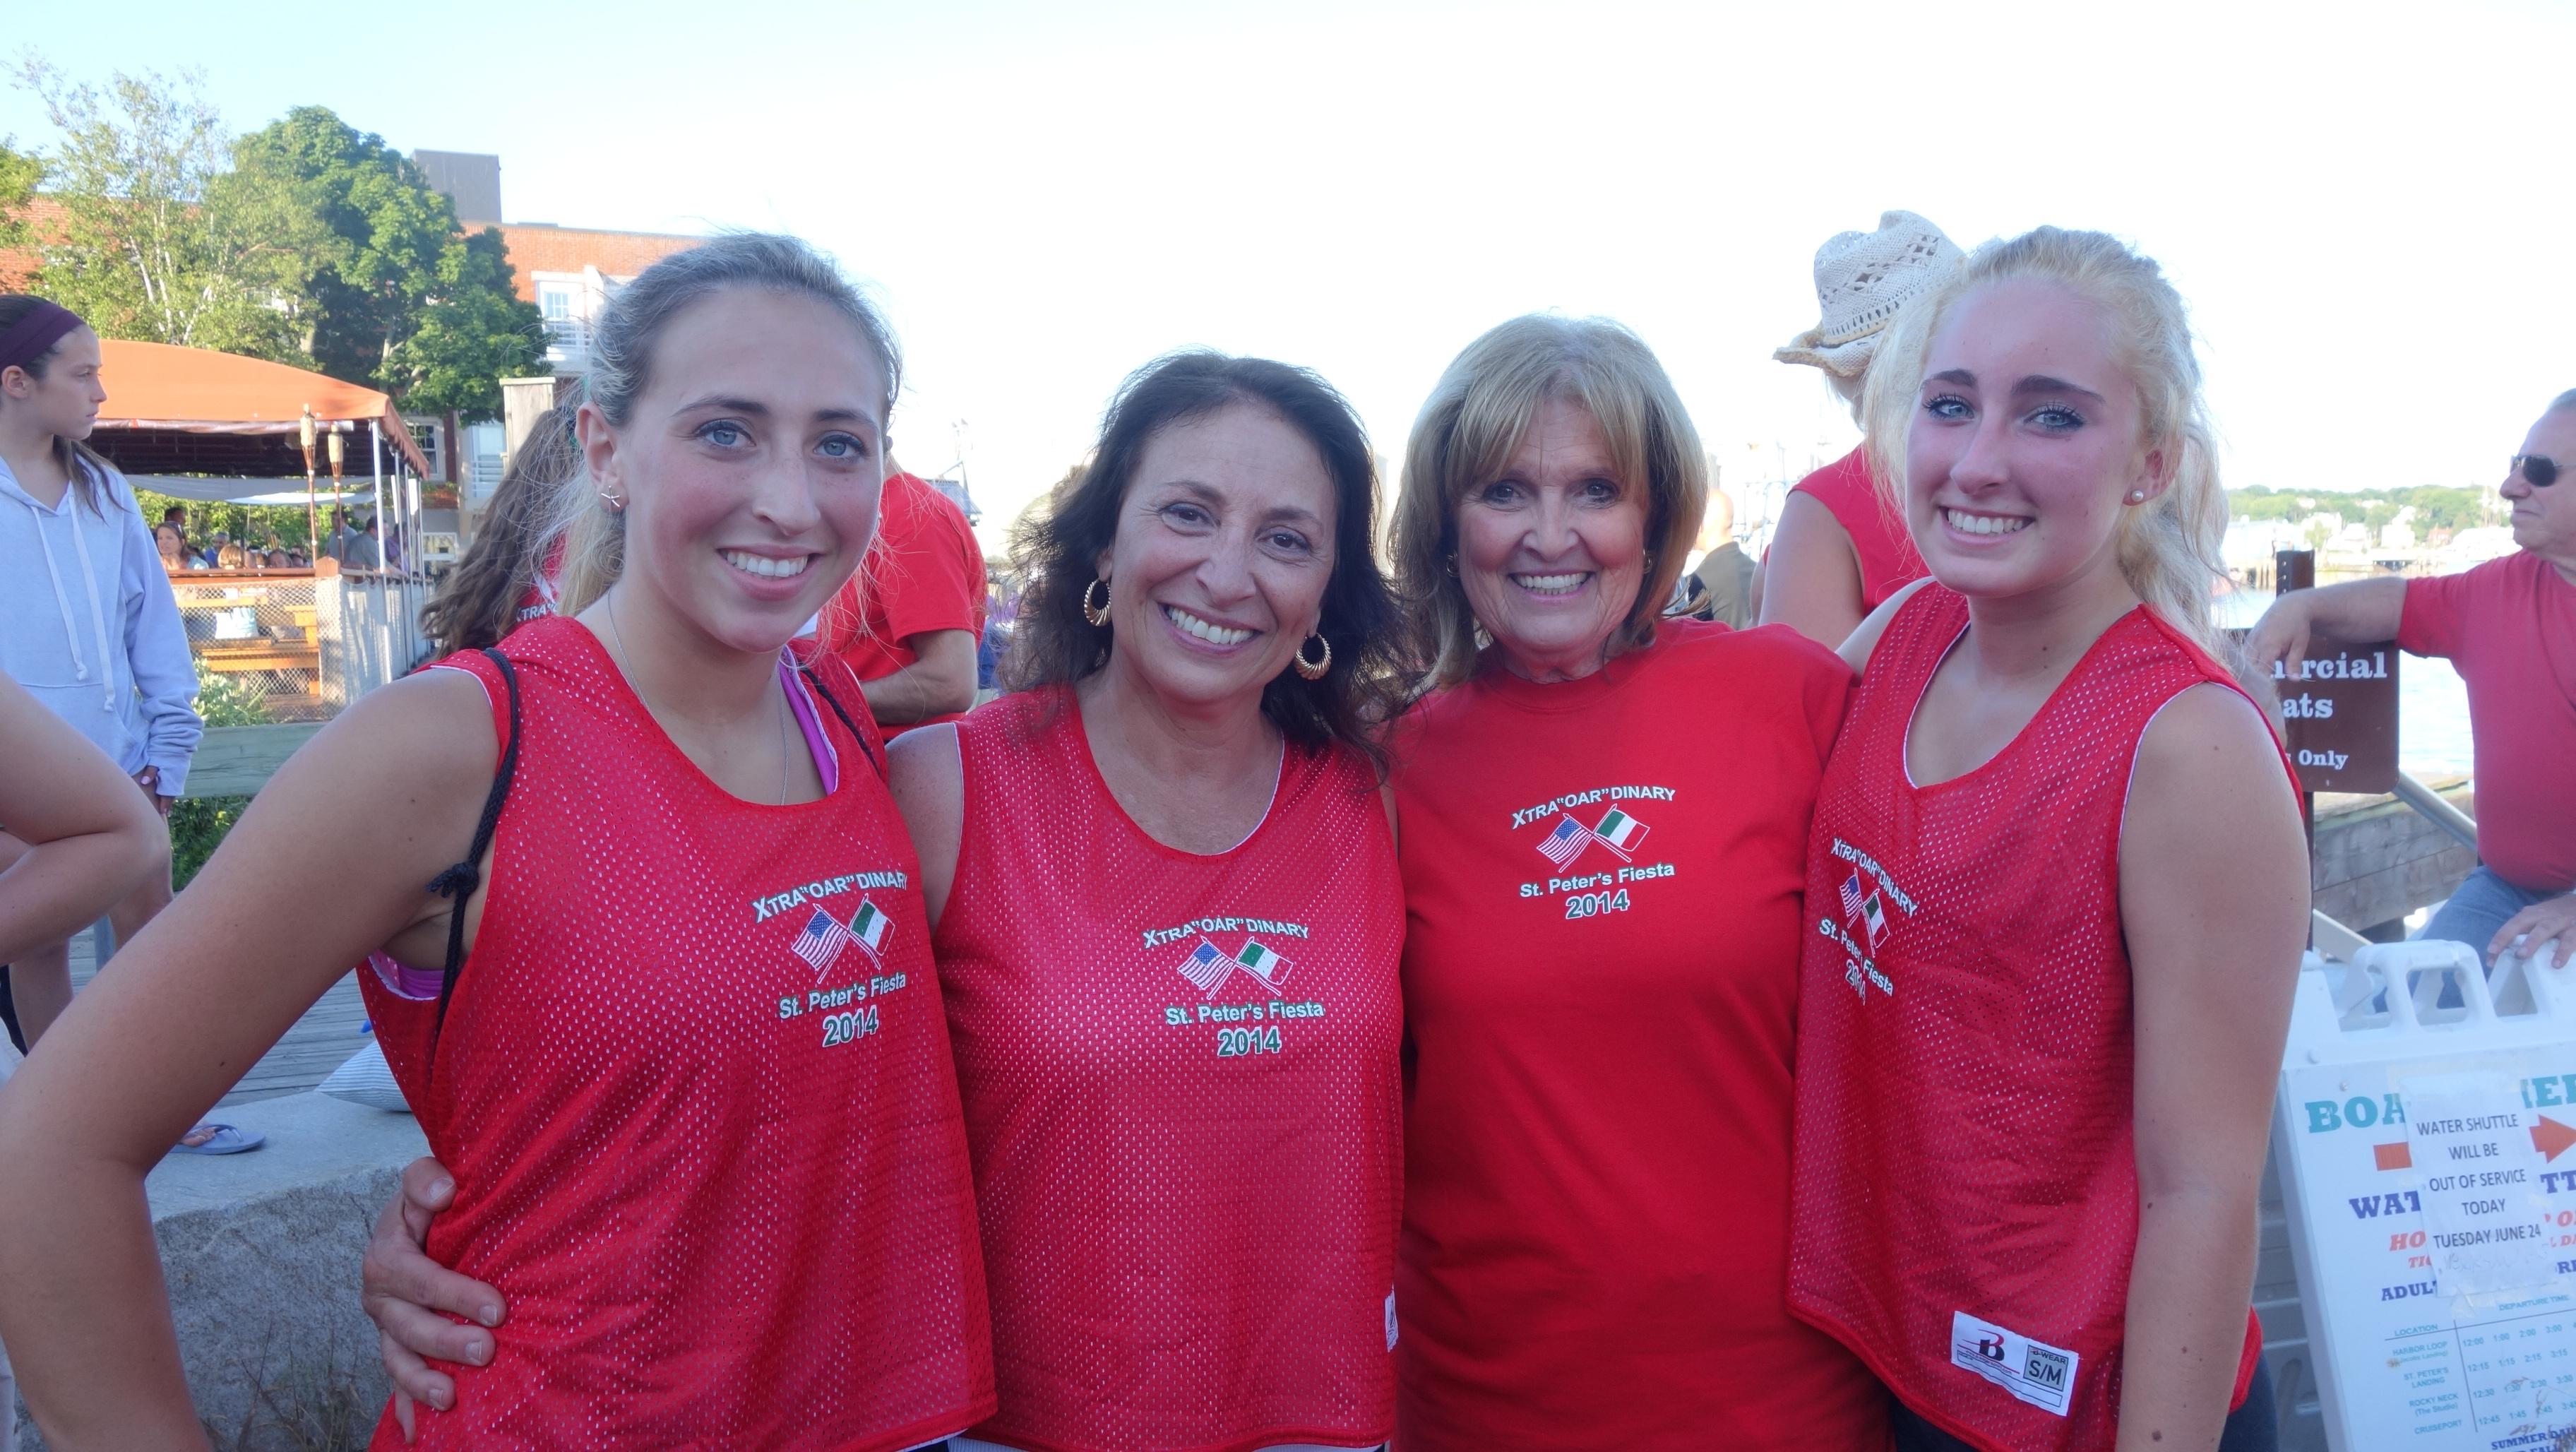 Amanda Race St. Peter's Fiesta 2014 Camps! 370